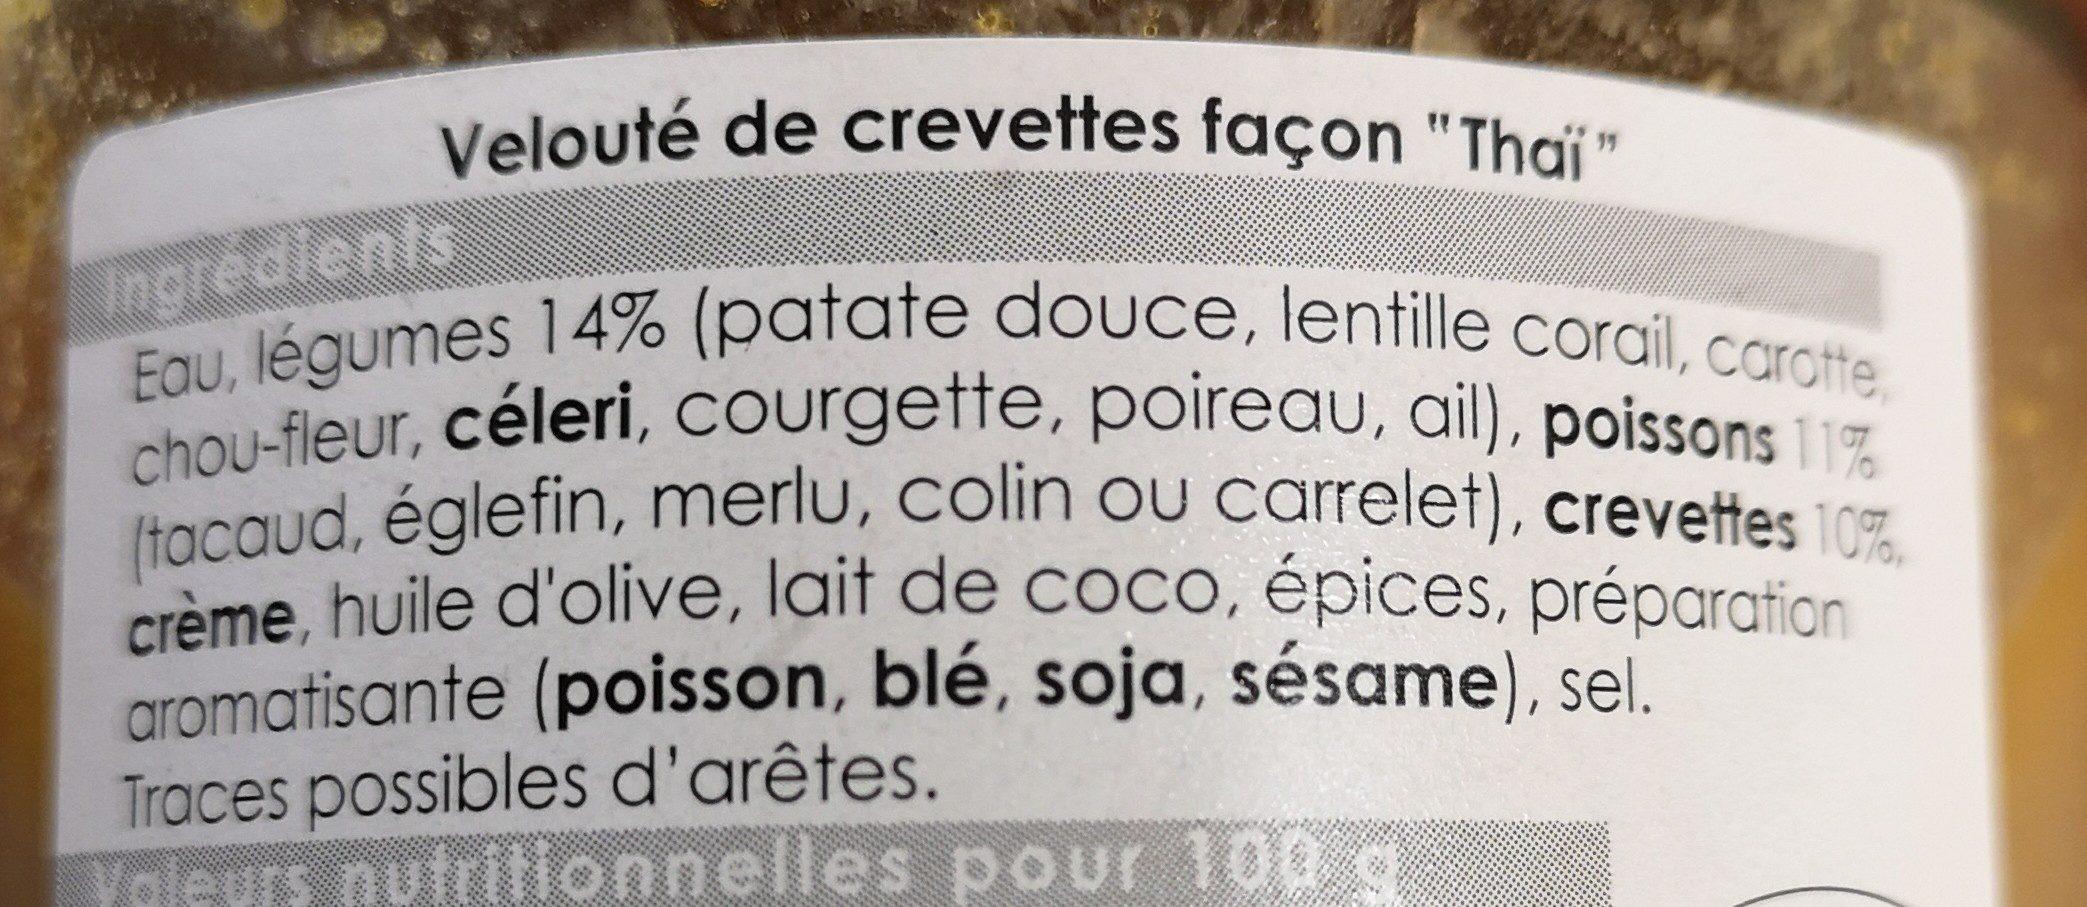 Velouté de crevette Thaï - Ingrediënten - fr